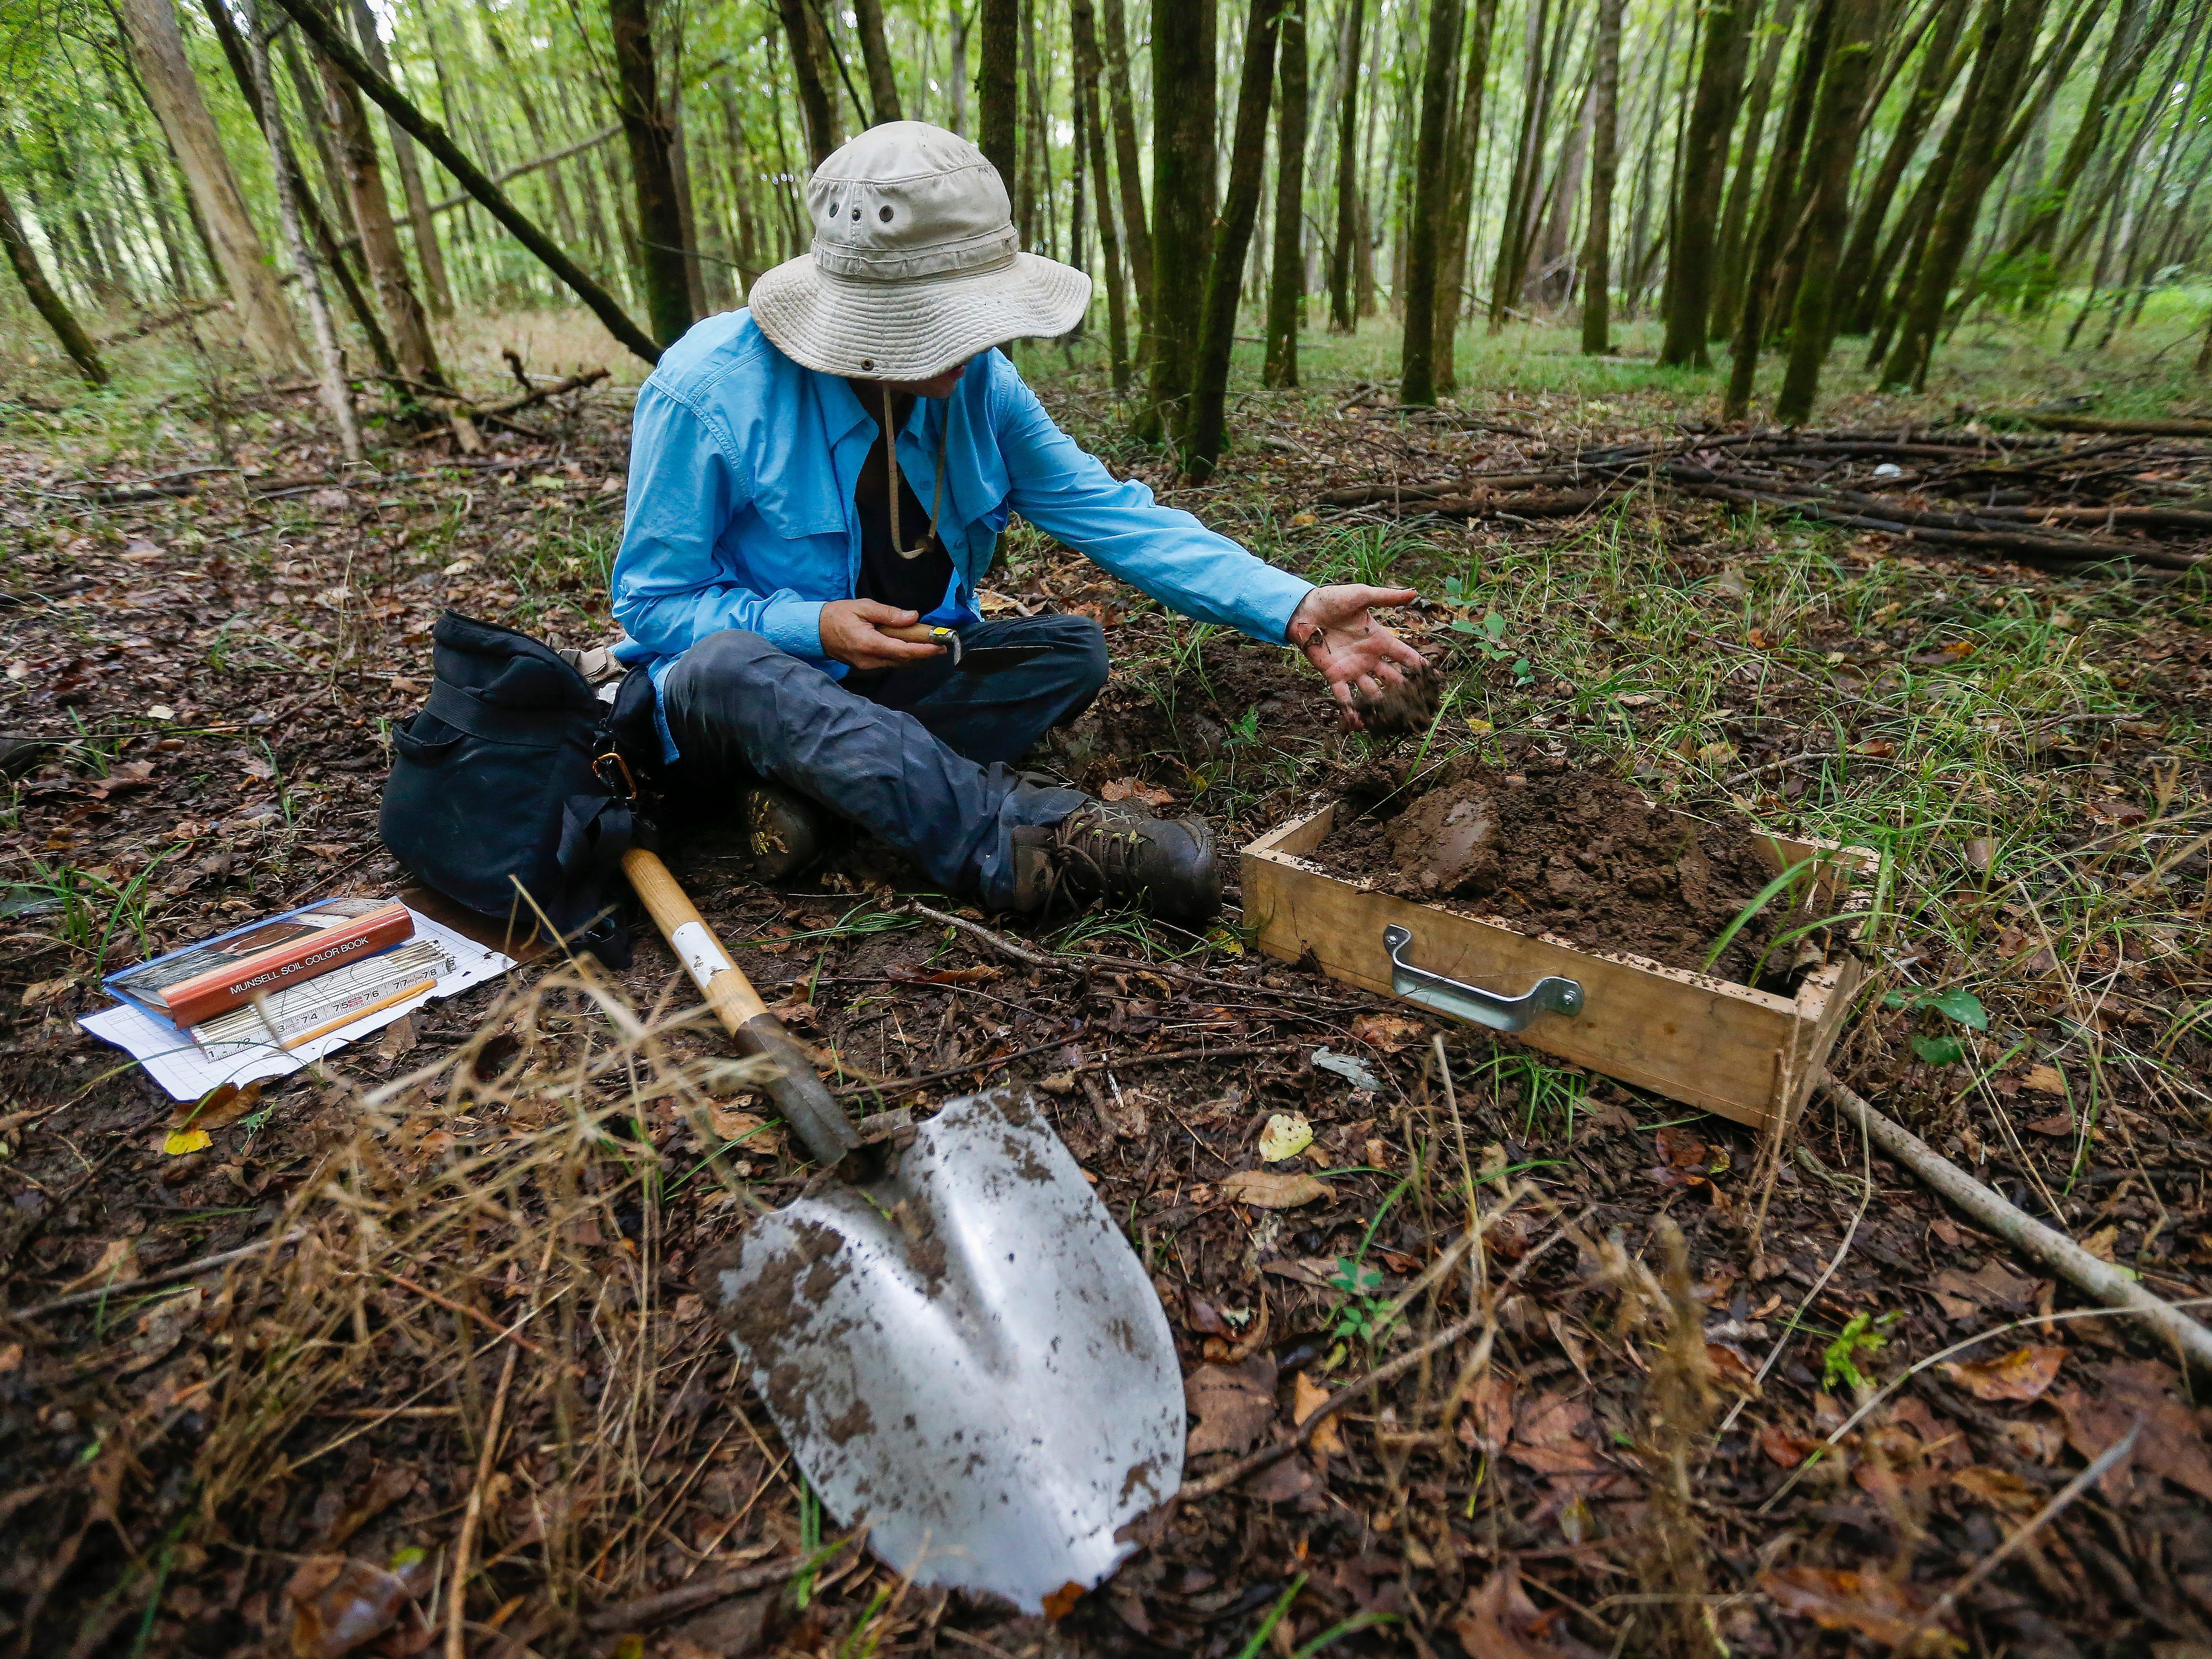 Archaeologists survey Lake Taneycomo